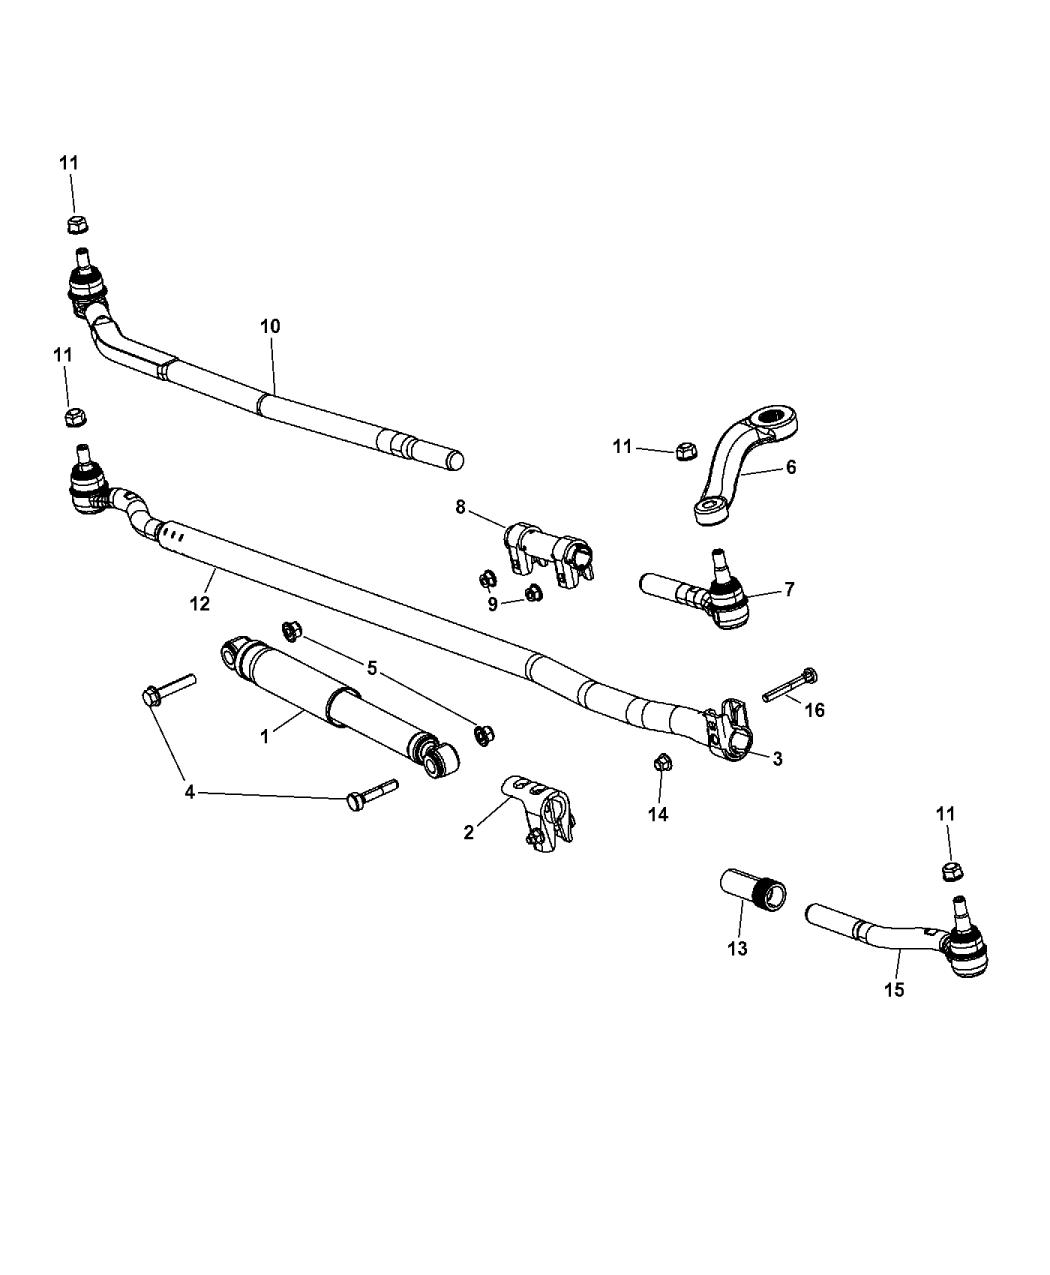 Groovy 2016 Jeep Wrangler Steering Linkage Mopar Parts Giant Wiring Digital Resources Bemuashebarightsorg